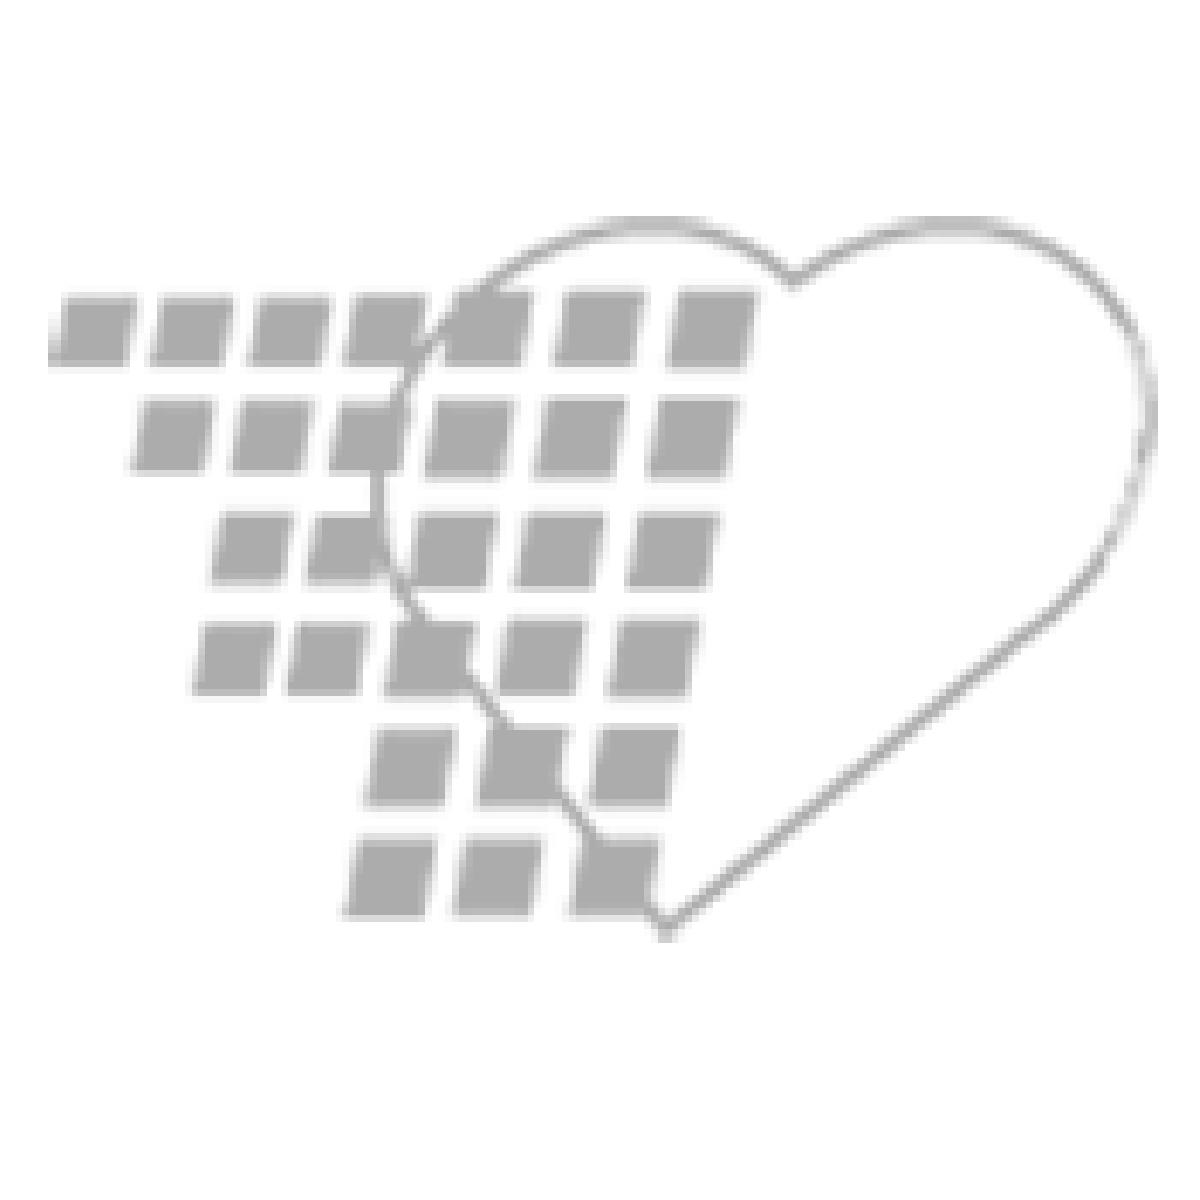 11-81-5505 Gaumard Noelle Dilating Cervix Upgrade Kit